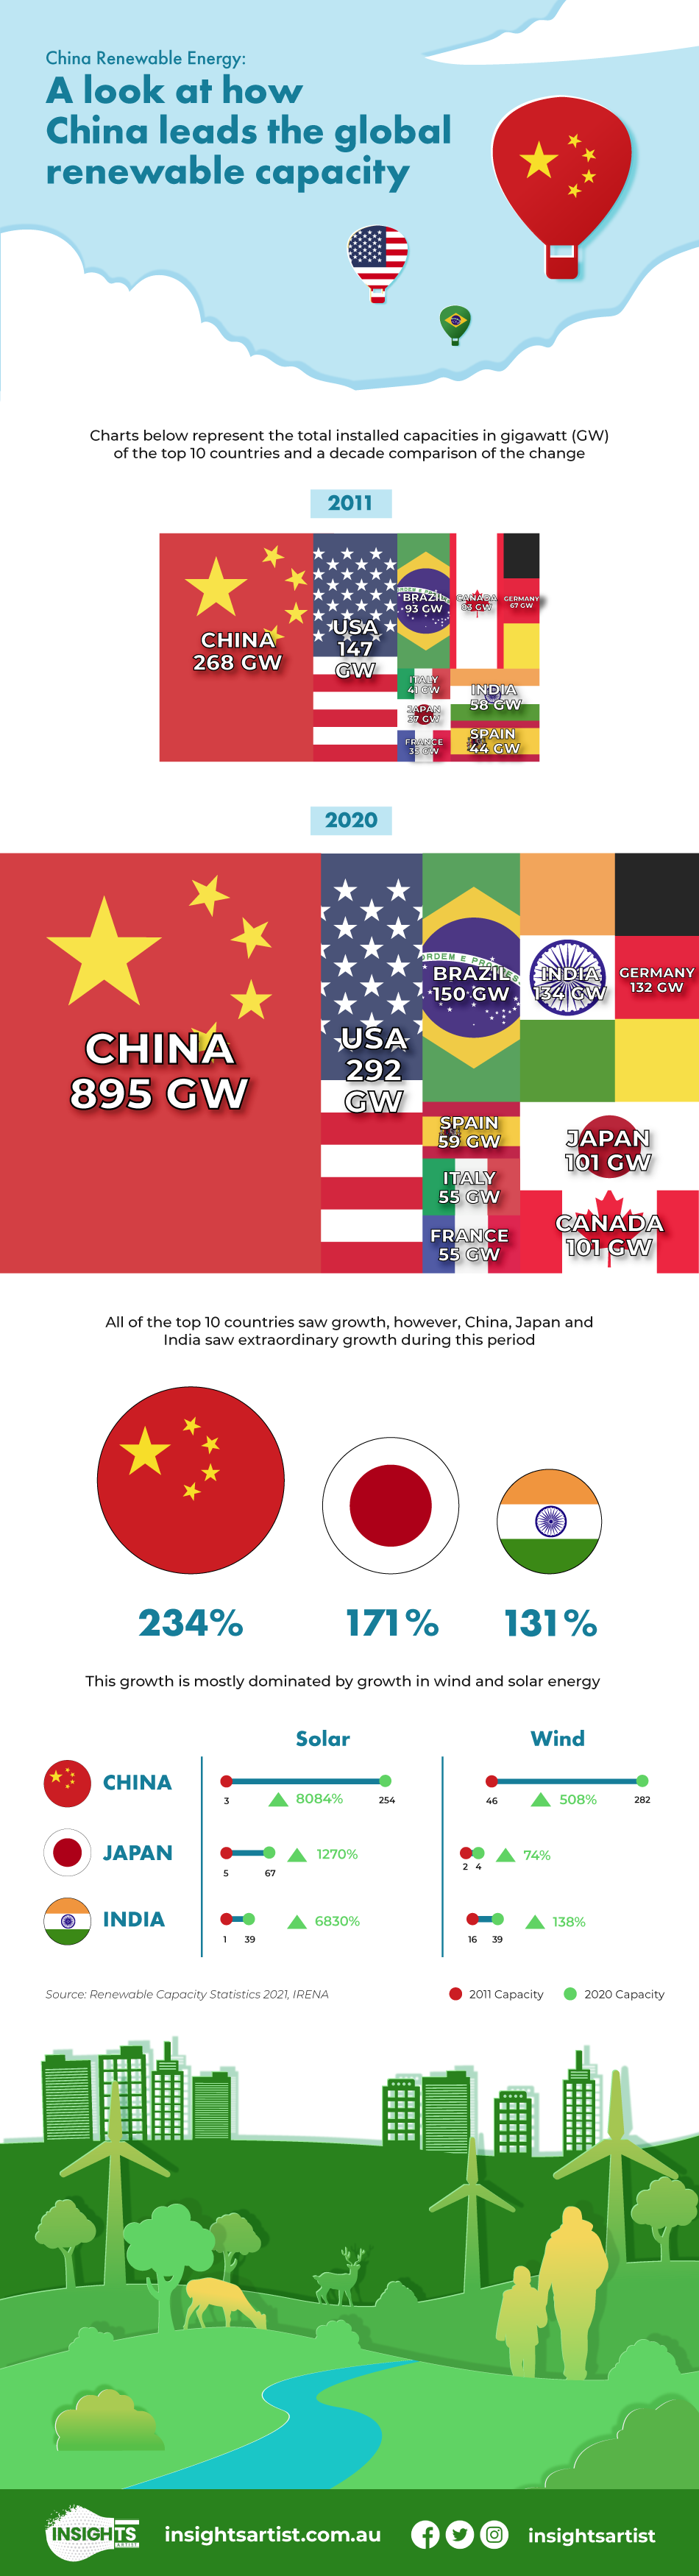 China and renewable energy